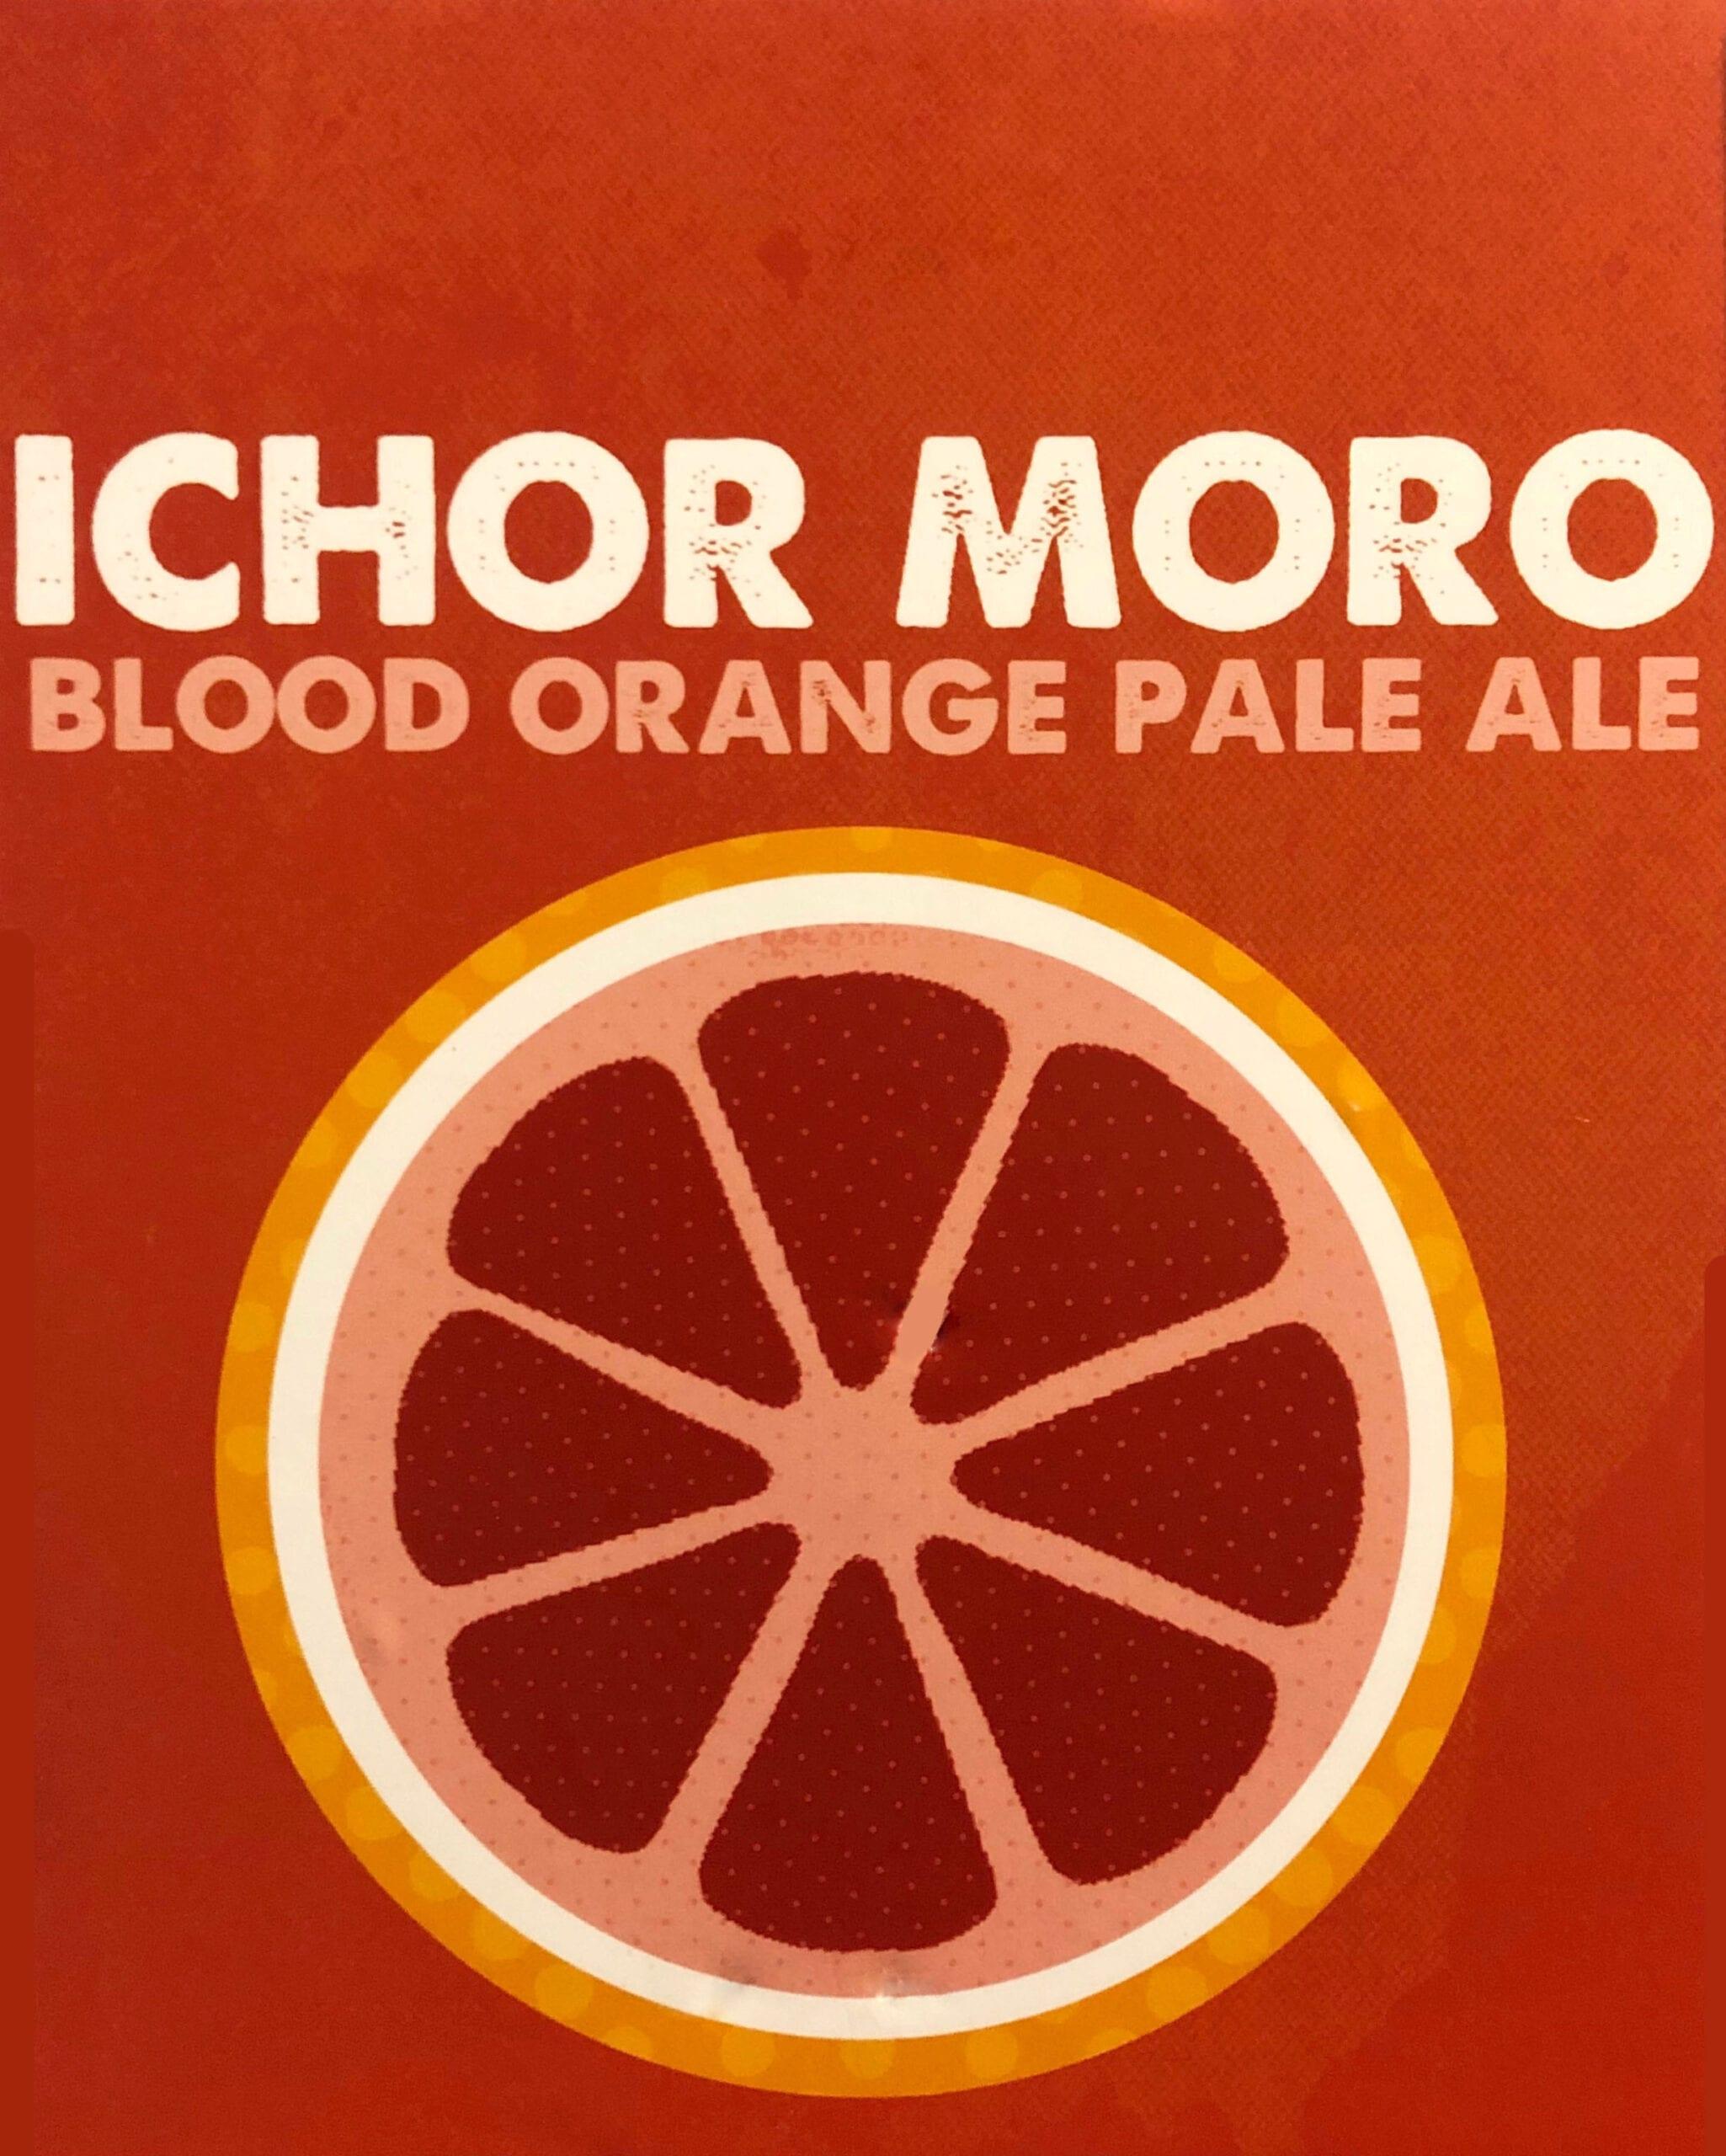 Ichor Moro